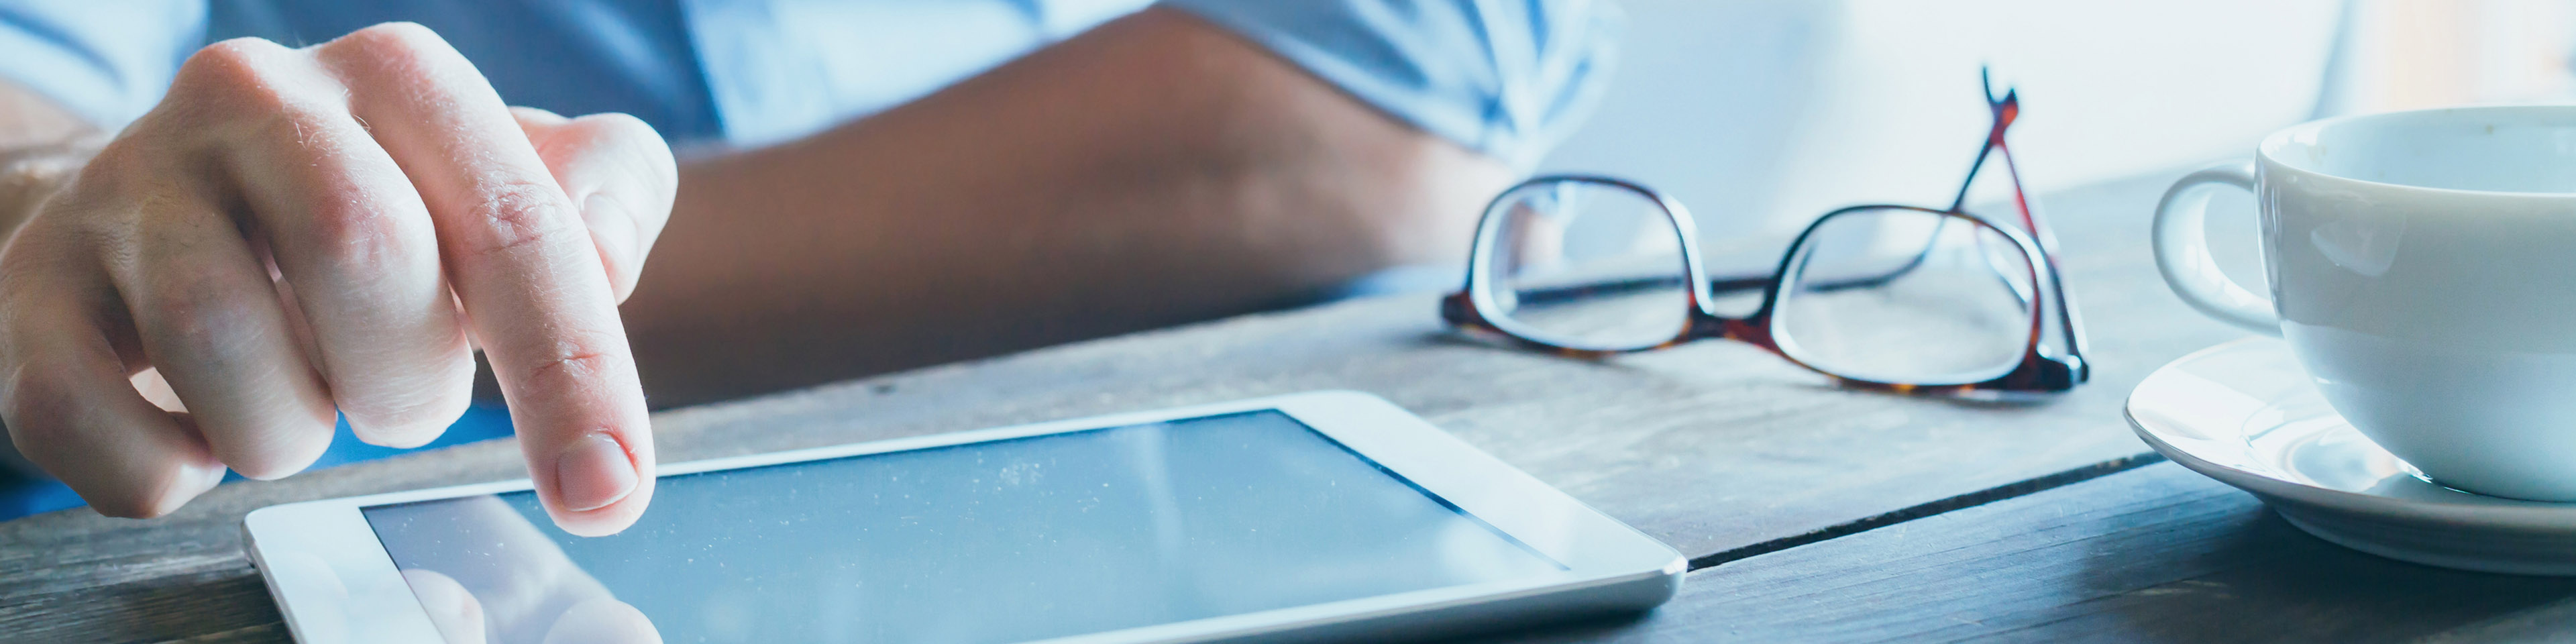 Man-using-digital-tablet-computer-close-up